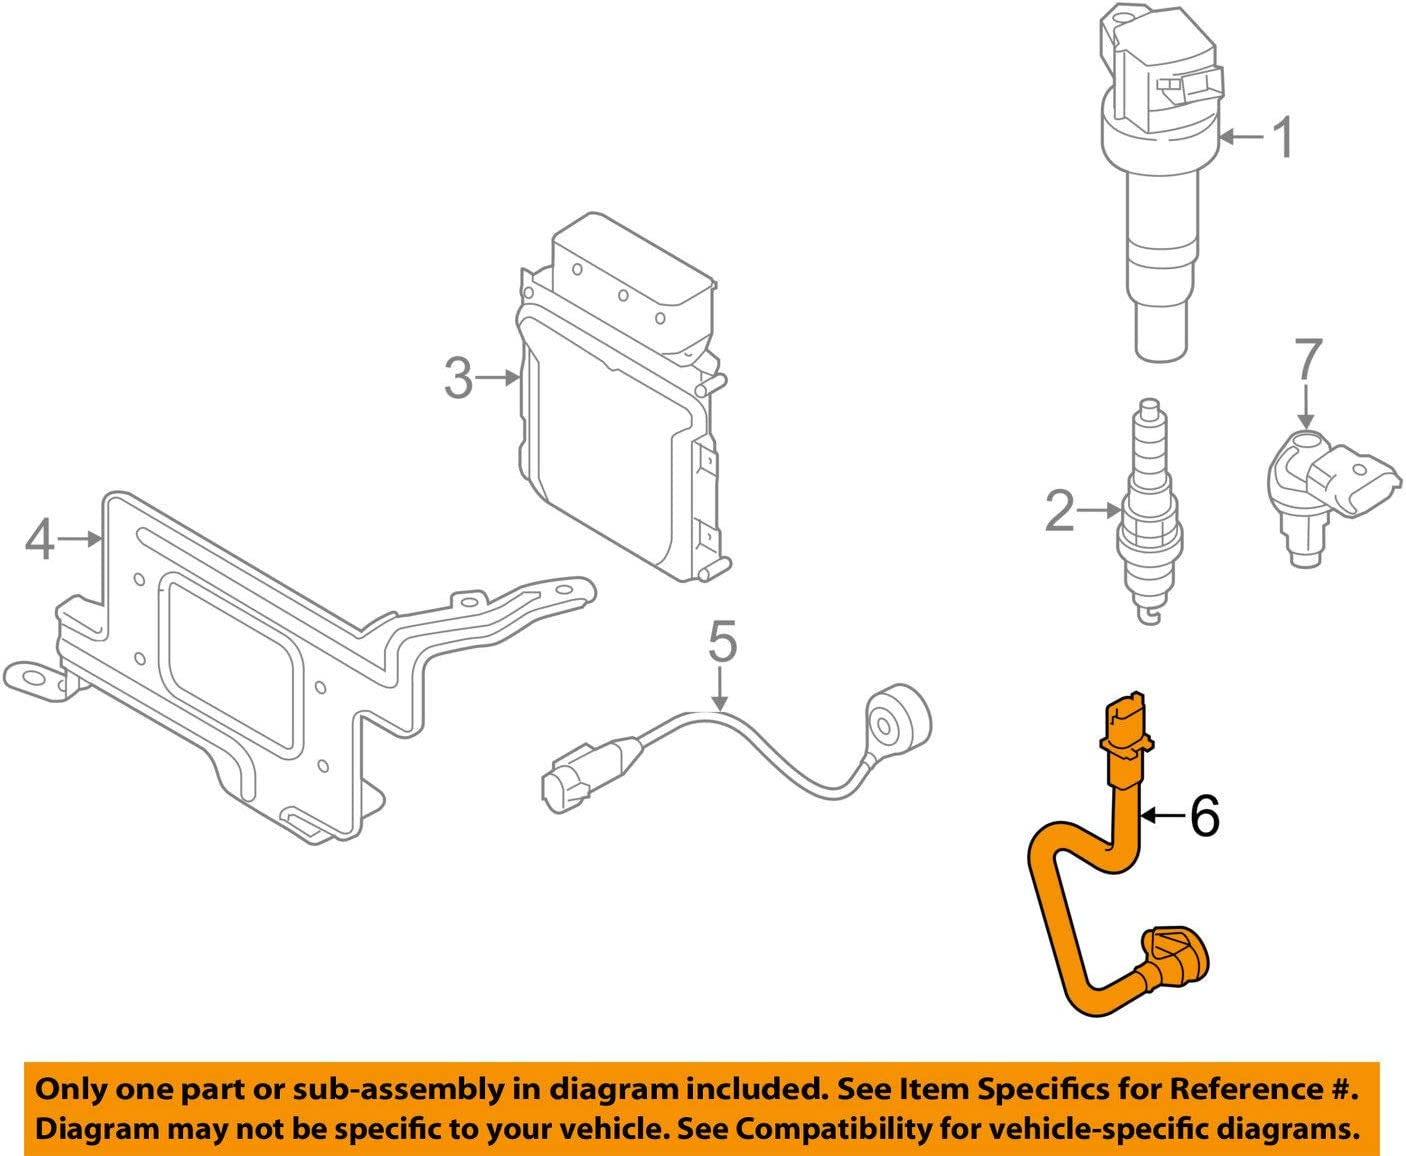 2014-2017 Kia Crankshaft Position Sensor 39180-2B030